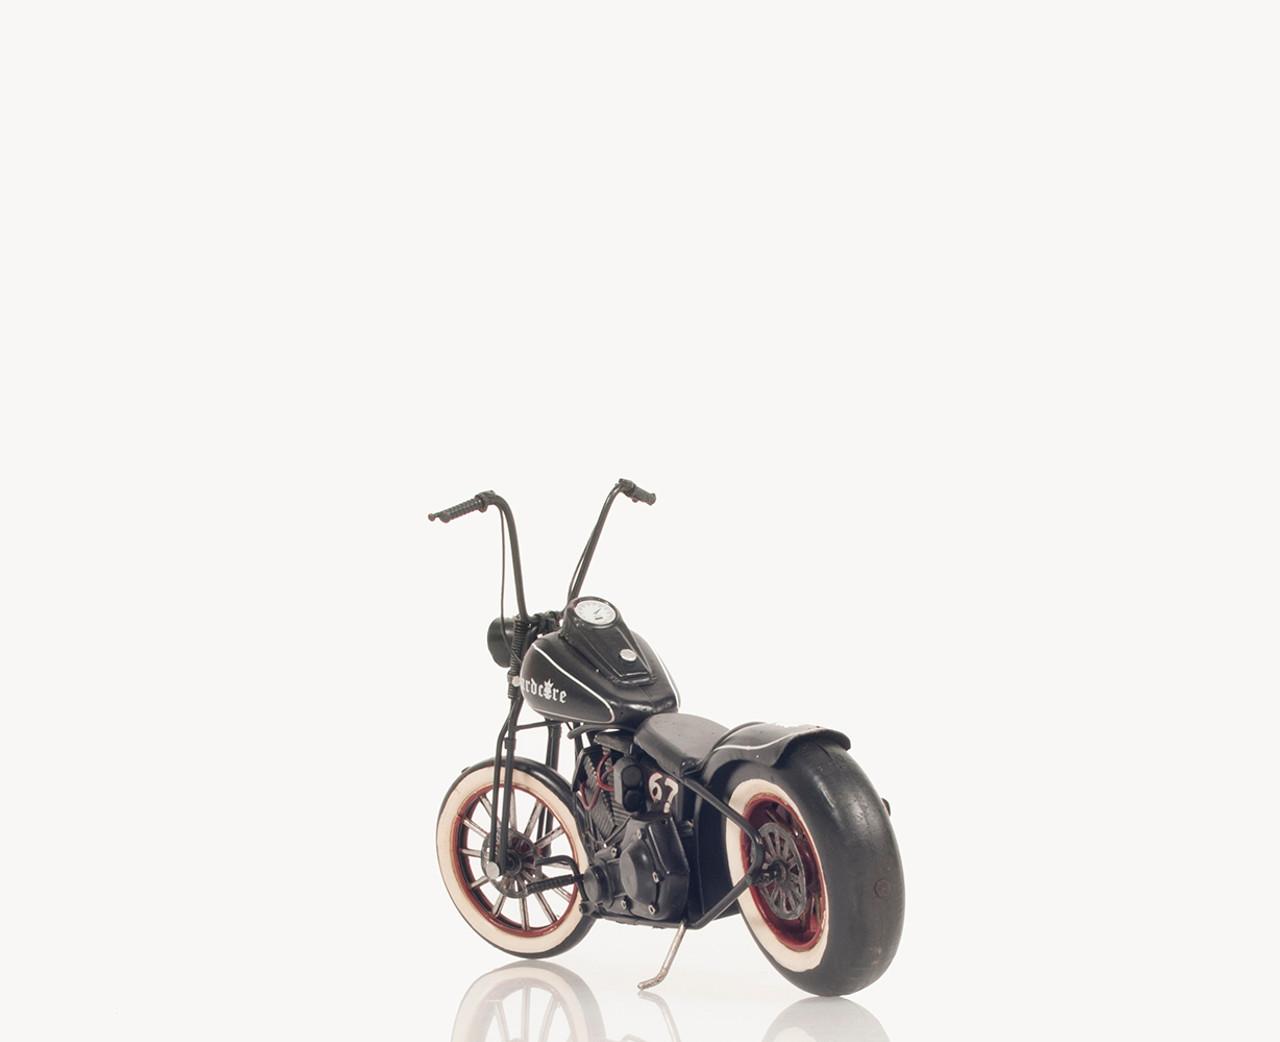 60s Harley Davidson Old Hardtail Chopper Motorcycle Metal Model